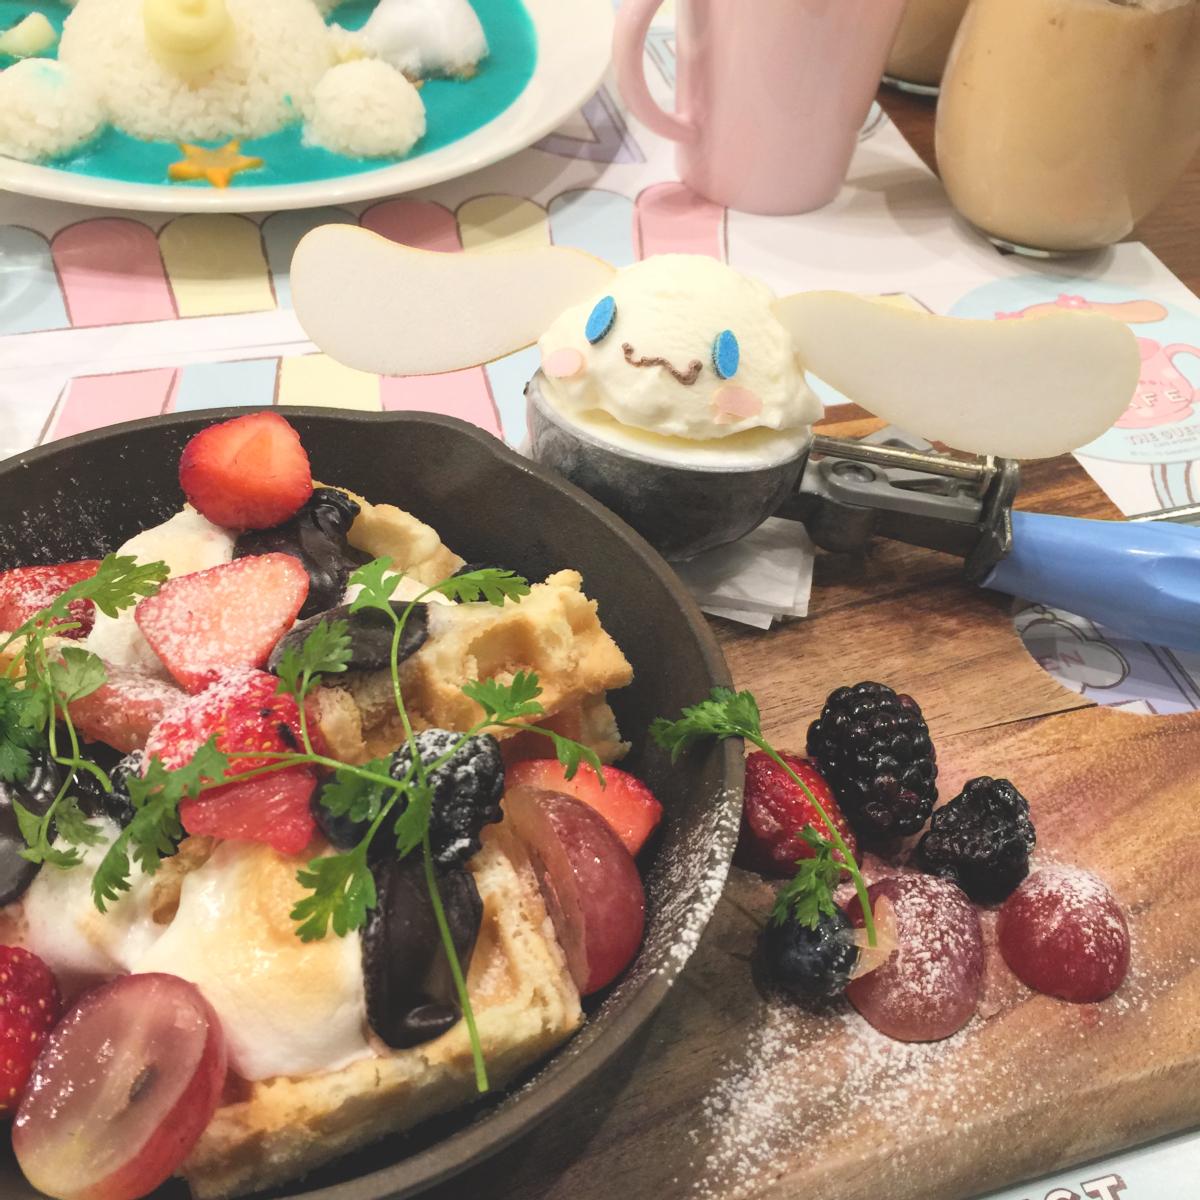 Photo 1-9-16, 11 40 52 AMcinnamoroll cafe kiddyland harajuku kawaii